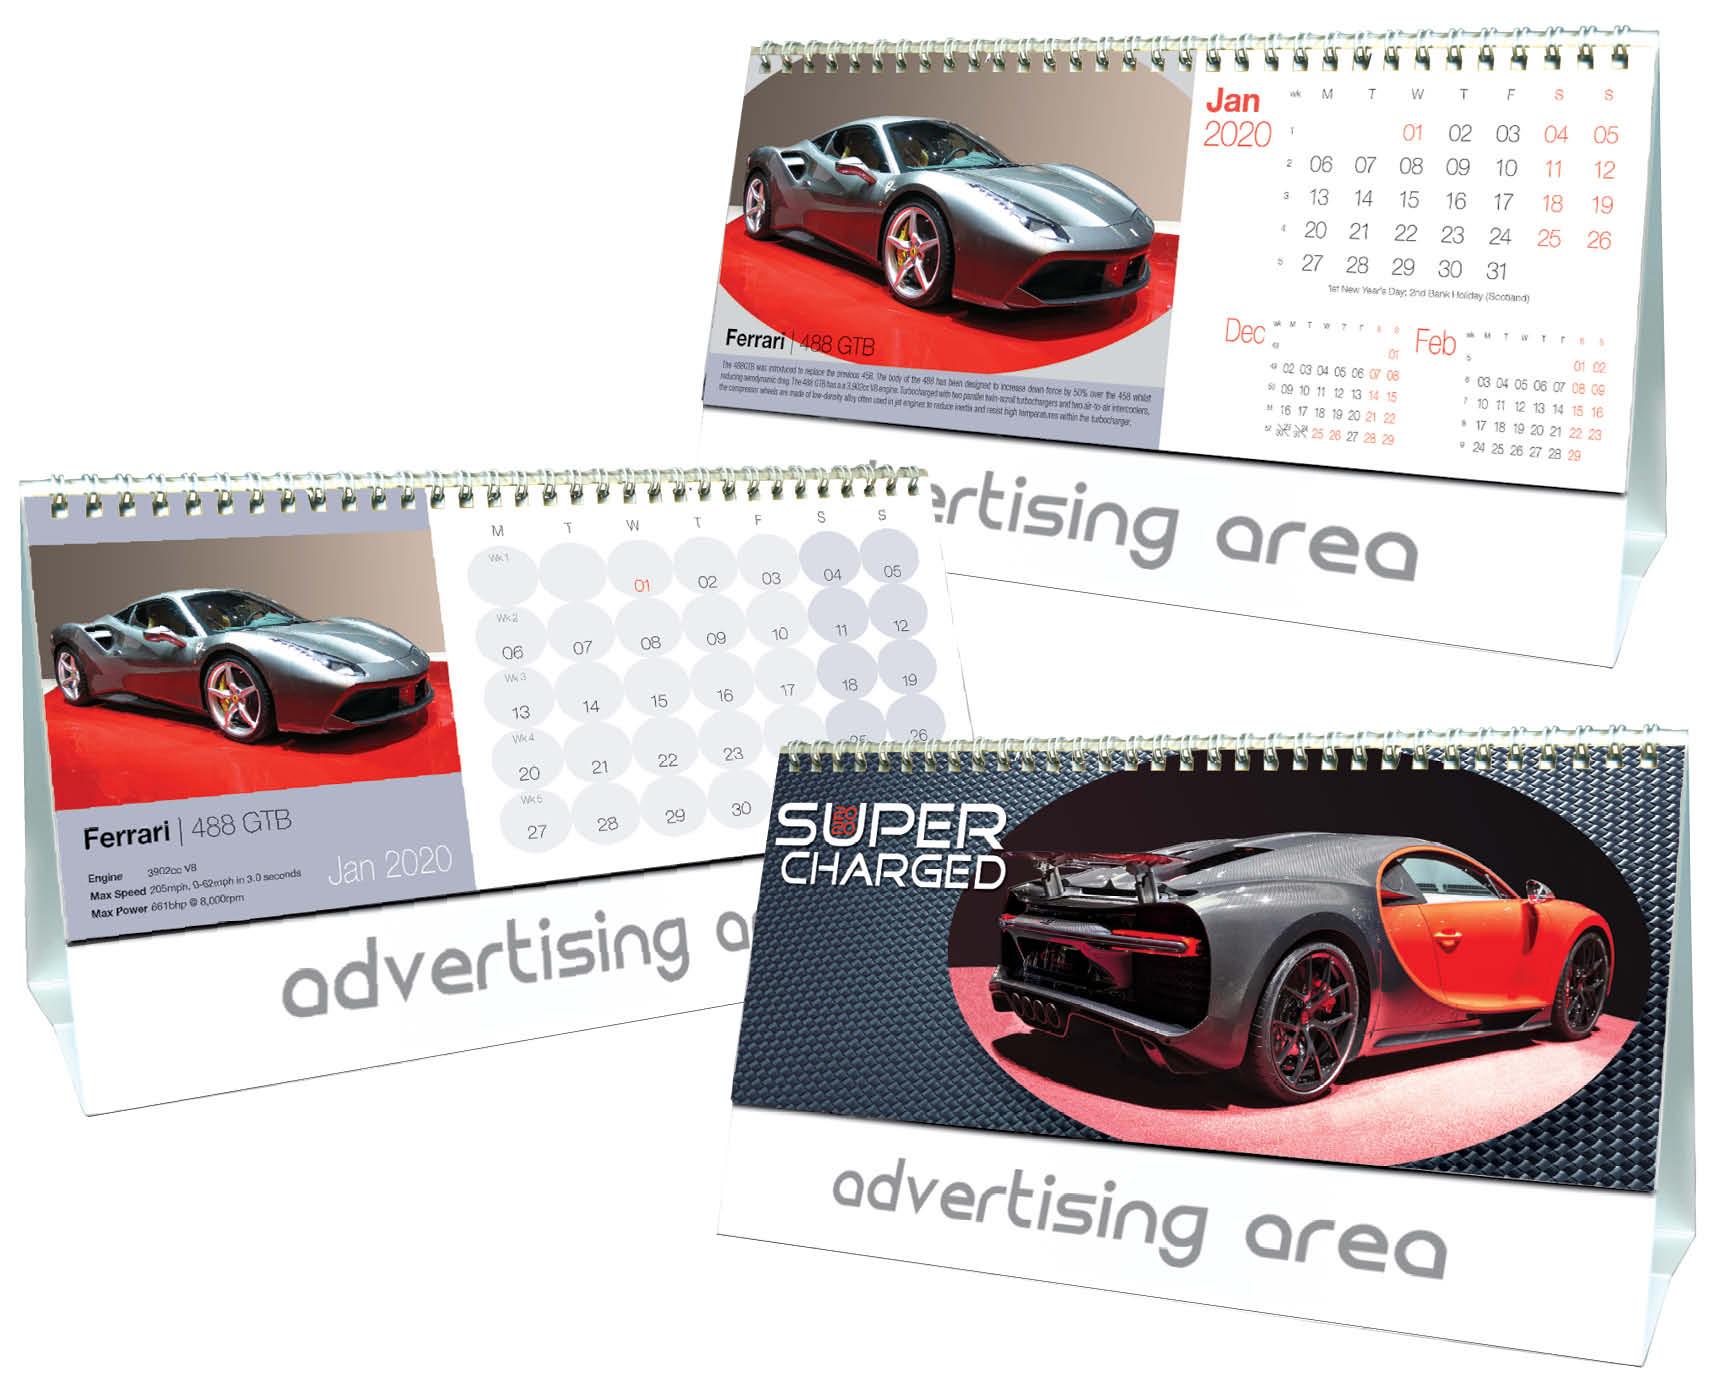 Supercharged-2020-Desk-Calendar-3D-Cover-Leaves